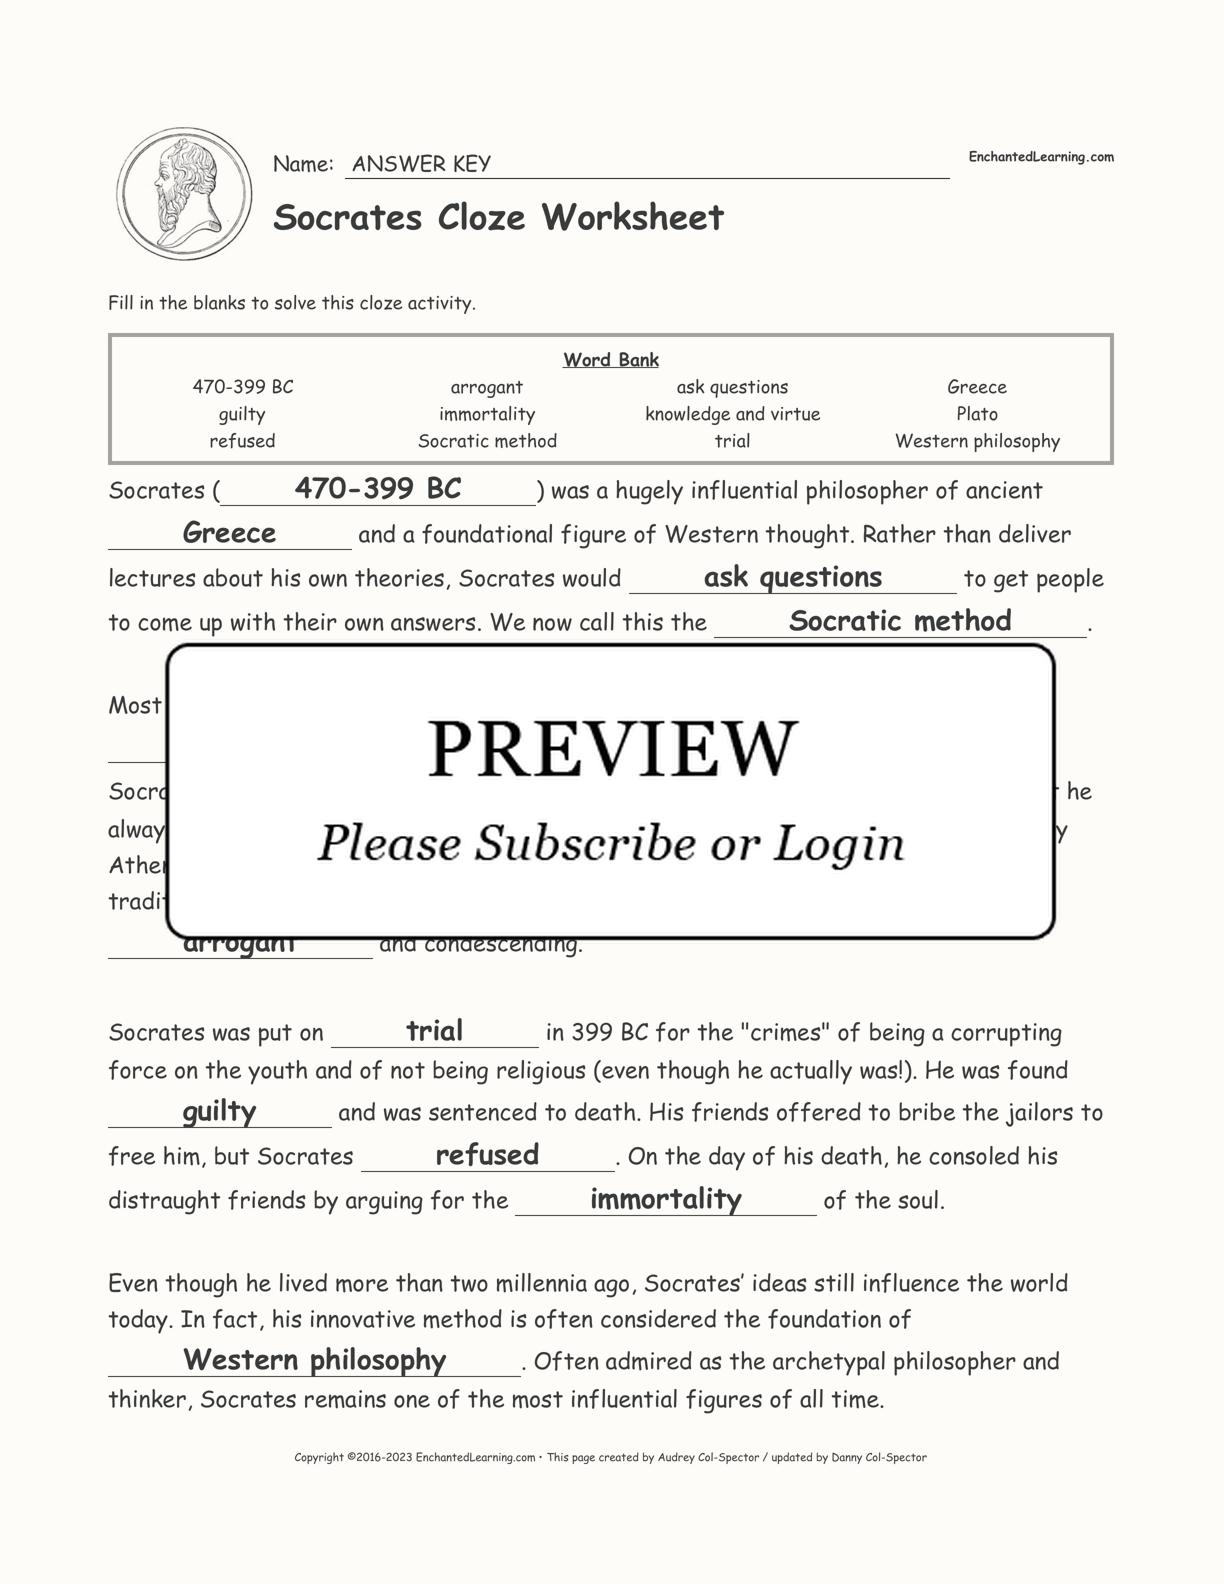 Socrates Cloze Worksheet